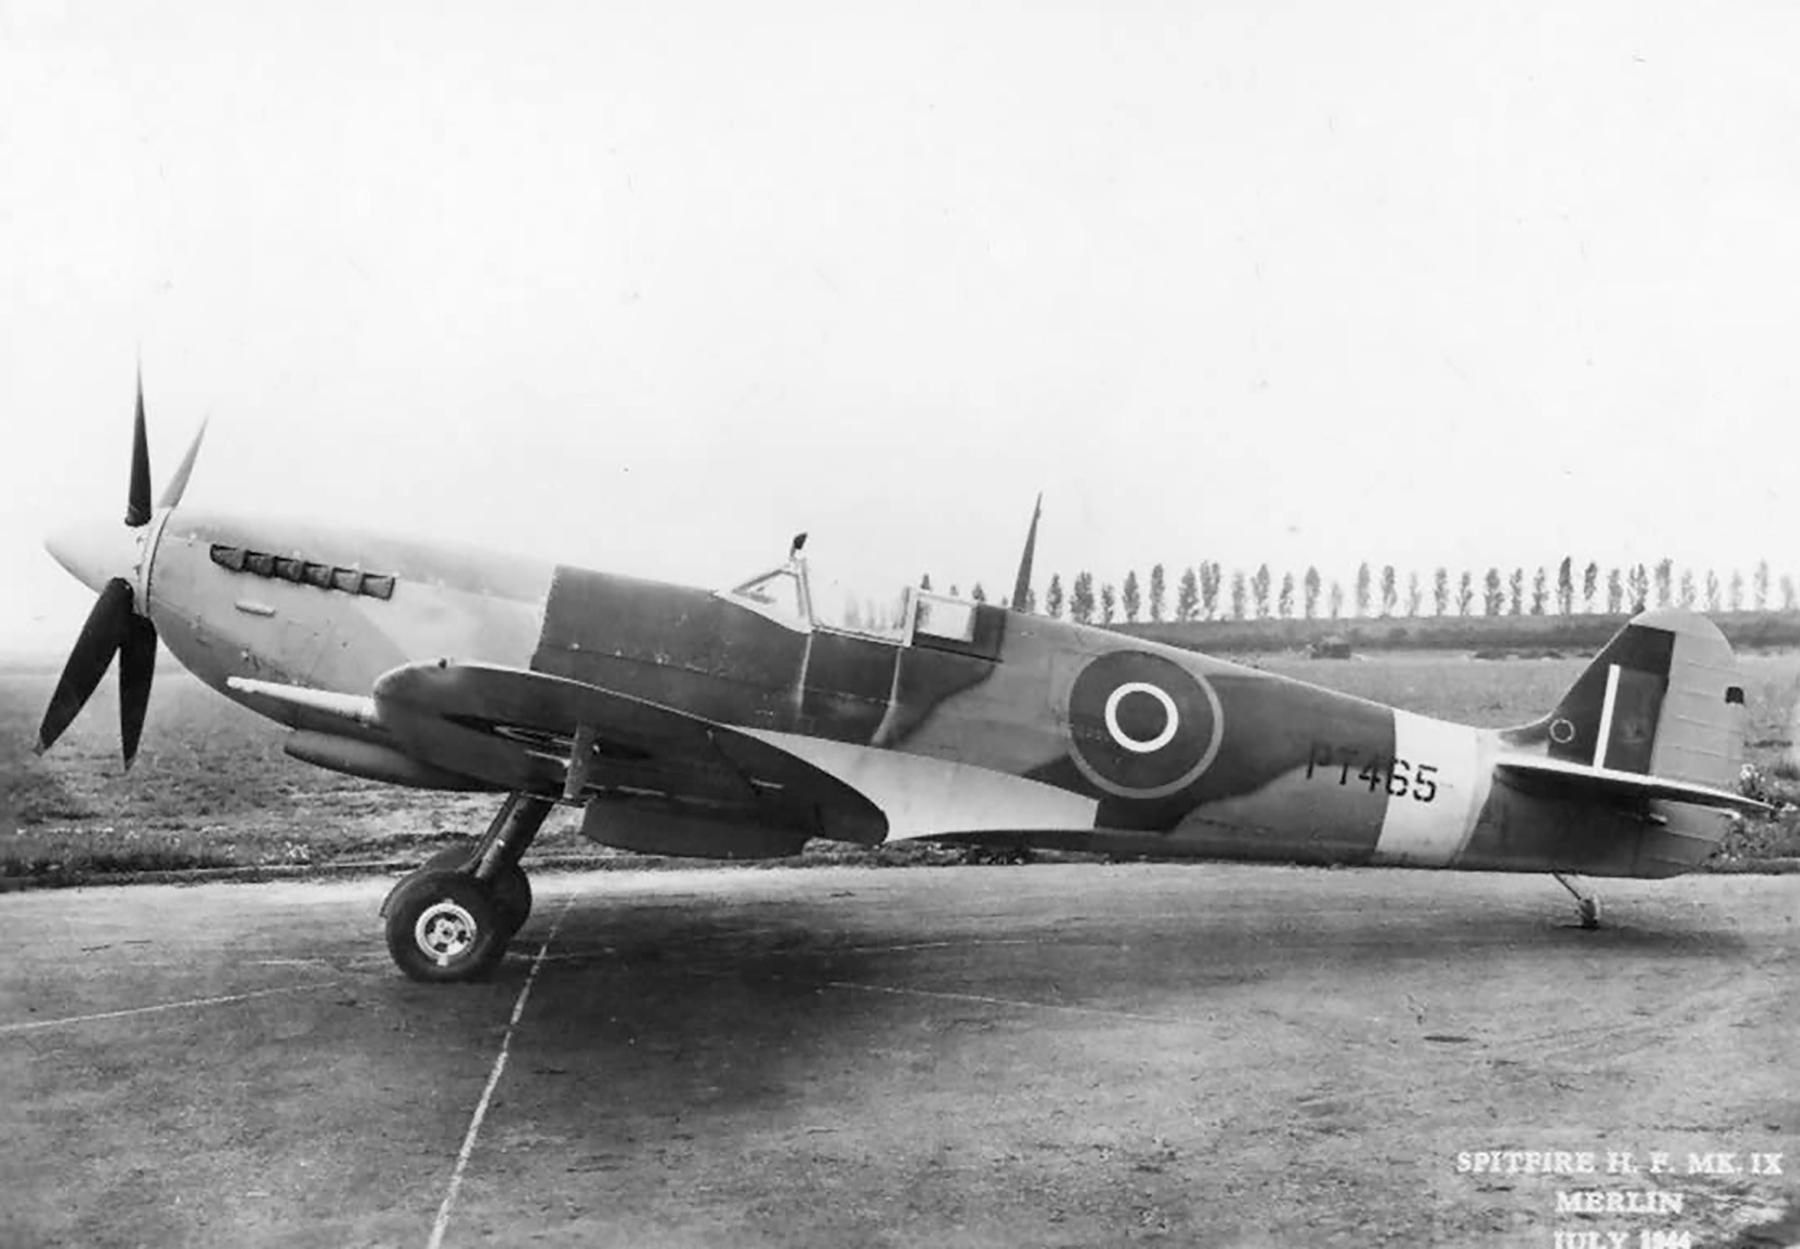 Spitfire HFIX RAF PT465 July 1944 web 01